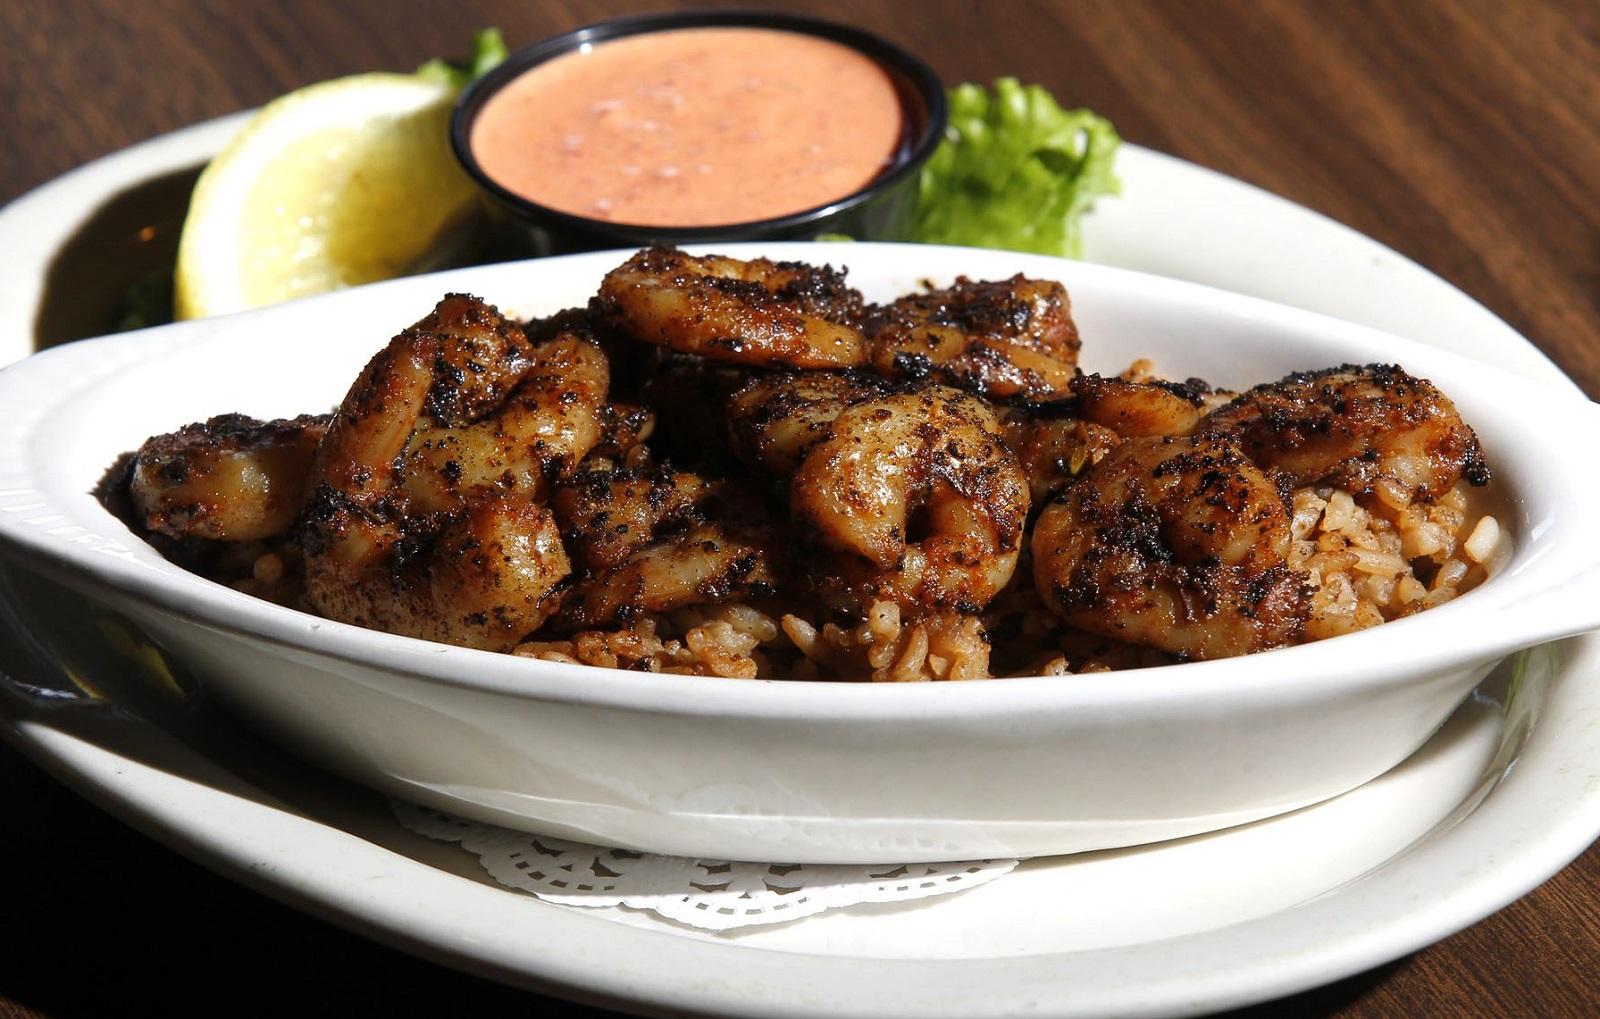 Chester's Cajun Grill's blackened shrimp appetizer. (Harry Scull Jr./Buffalo News)